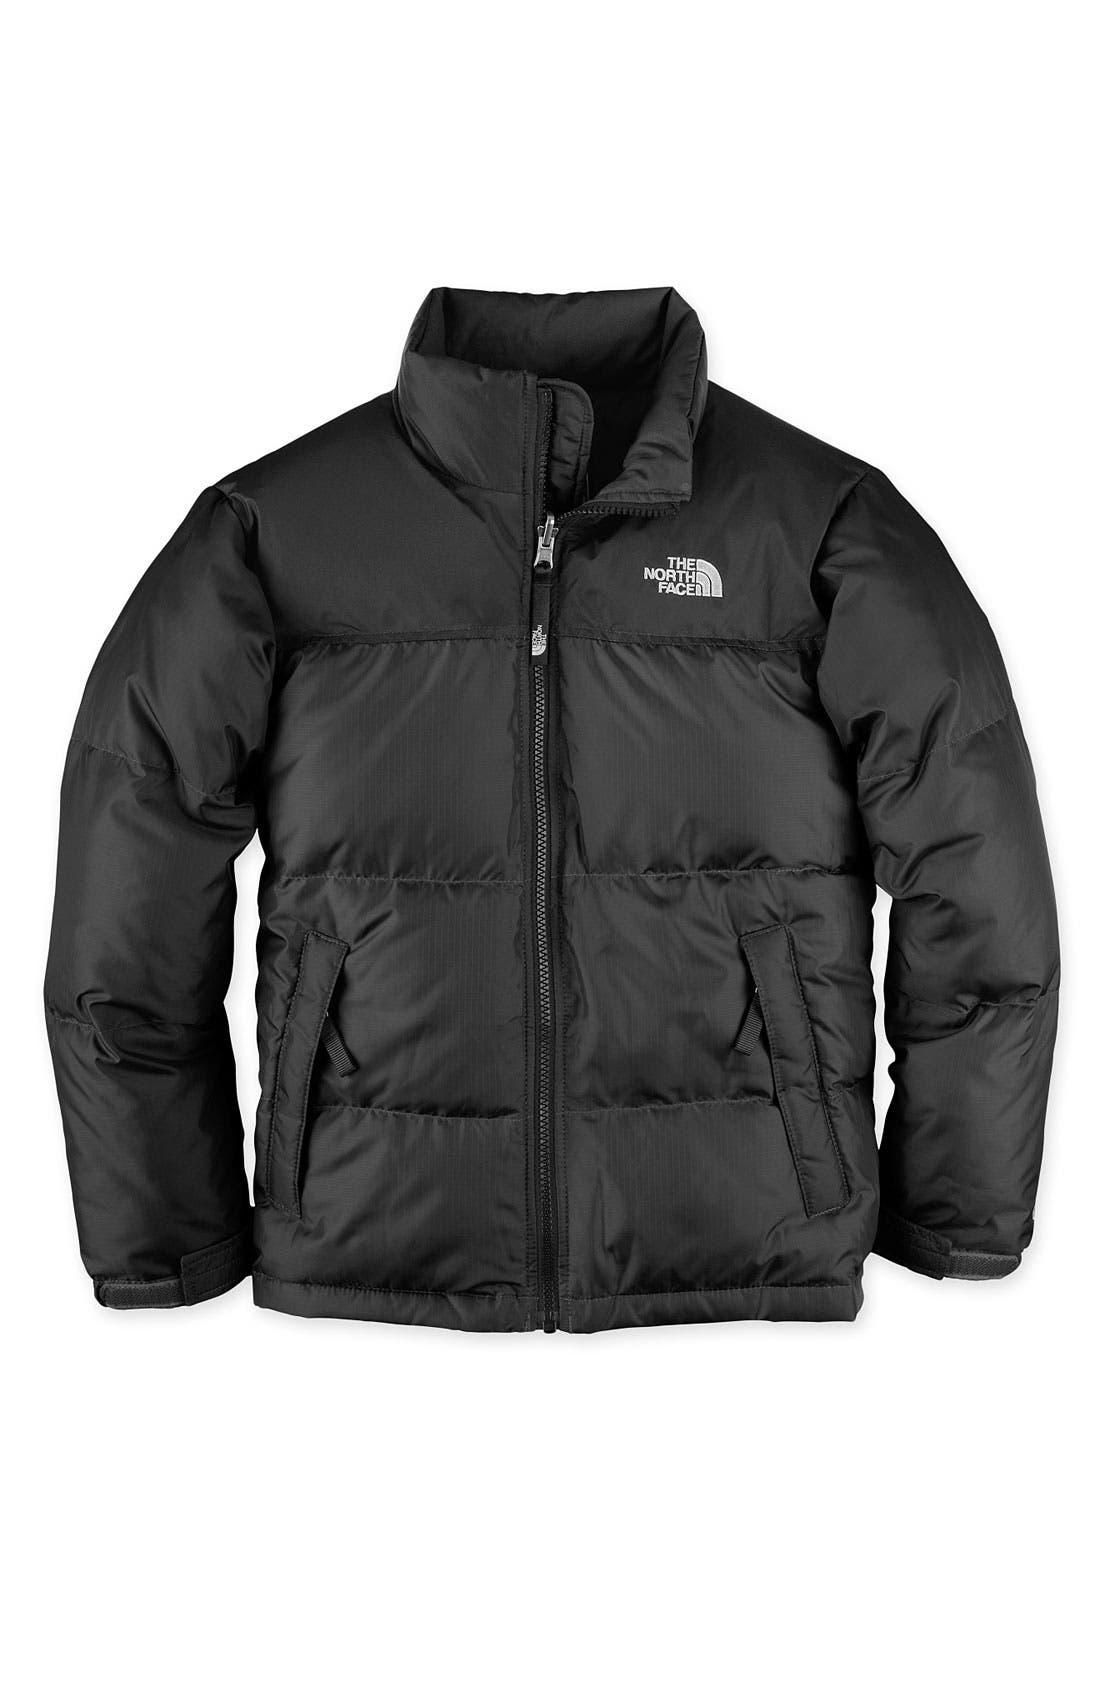 Alternate Image 1 Selected - The North Face 'Nuptse' Jacket (Little Boys)